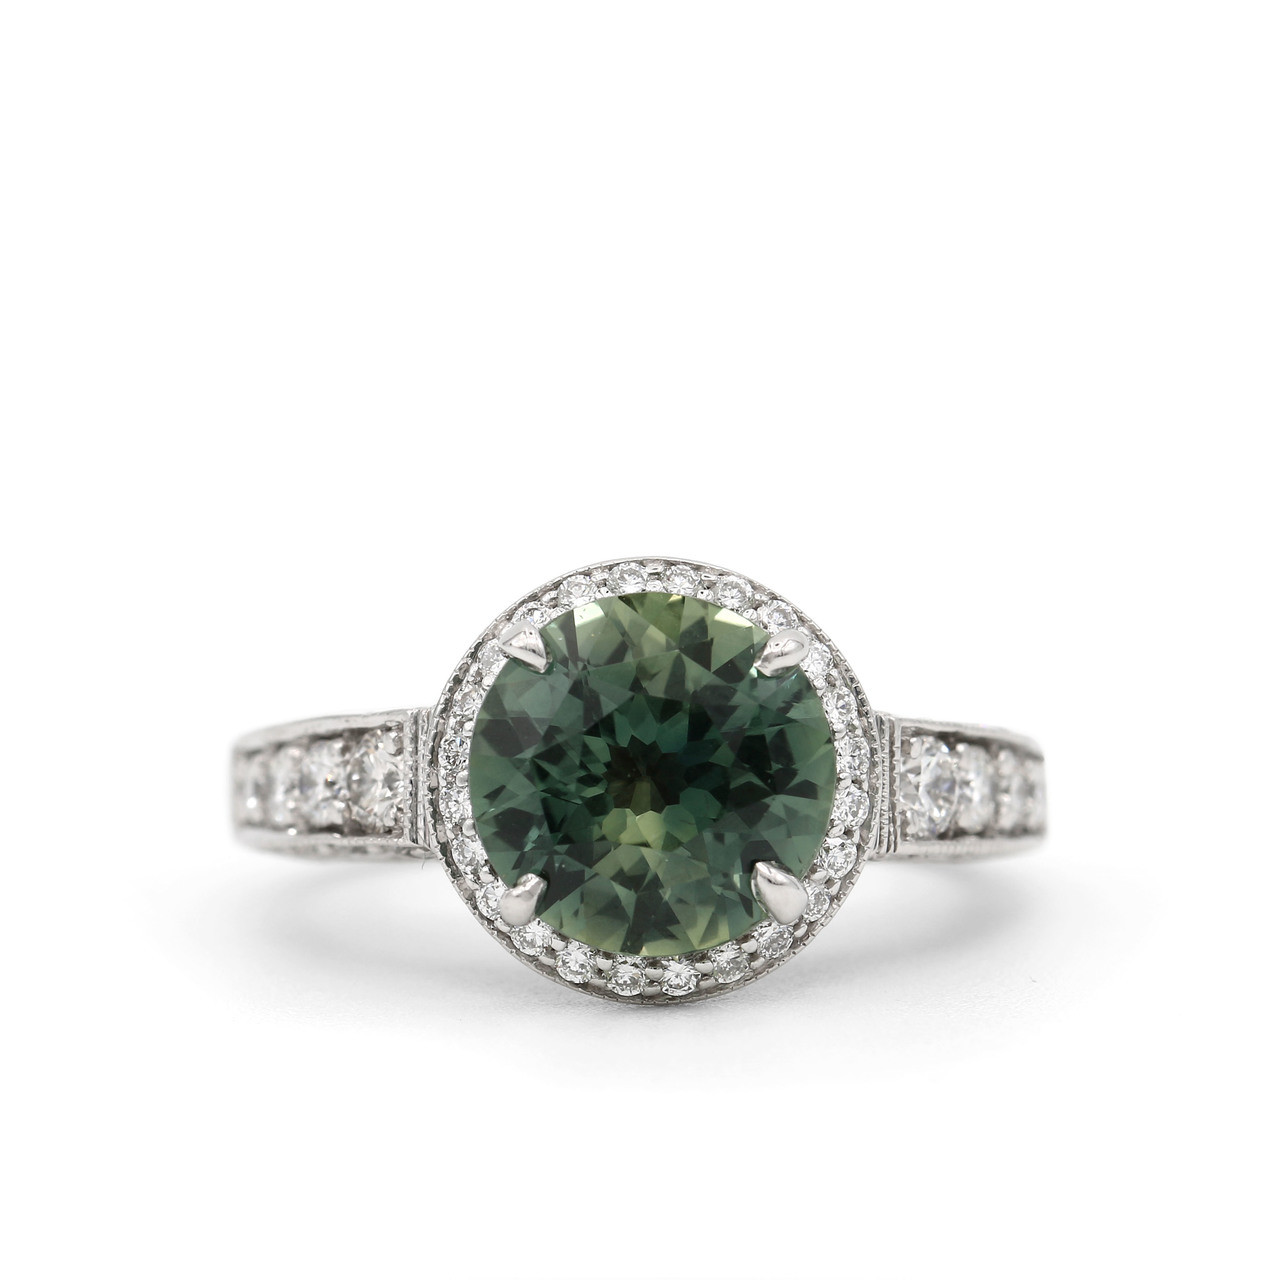 6bd6925182757 3.10 Carat Teal Sapphire & Diamond Ring in 18K White Gold